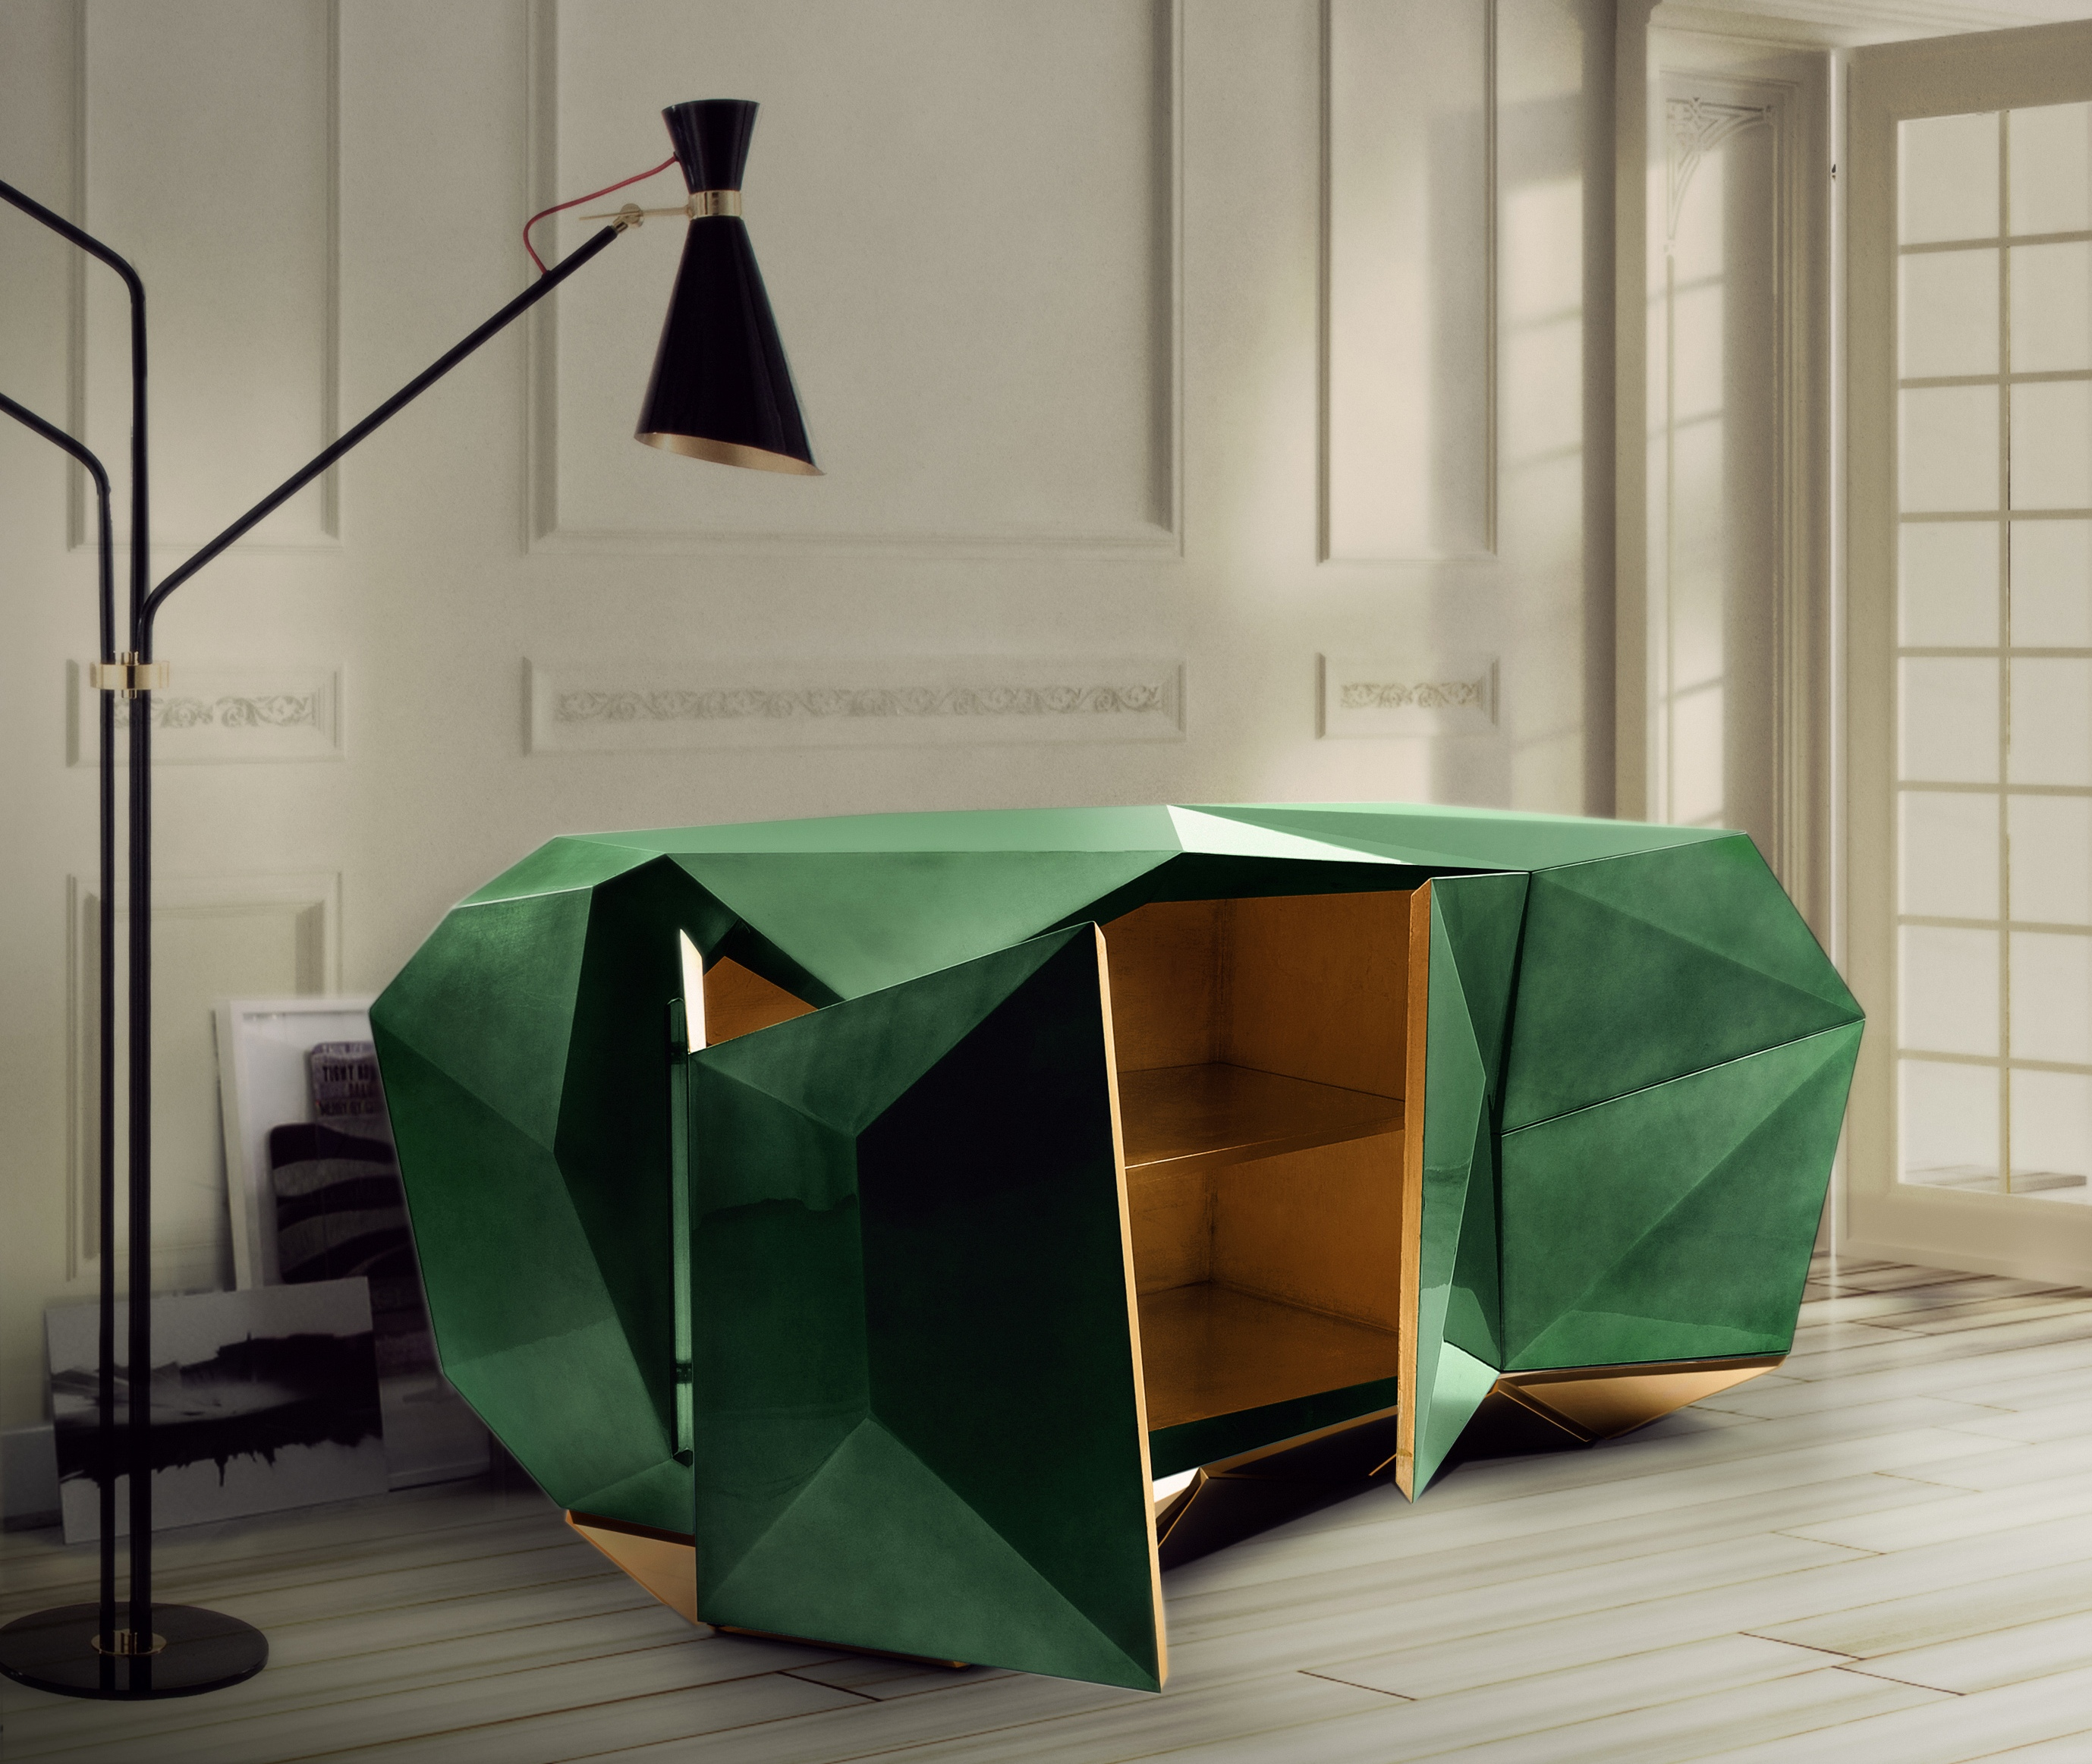 Maison&Objet 2013: Trends